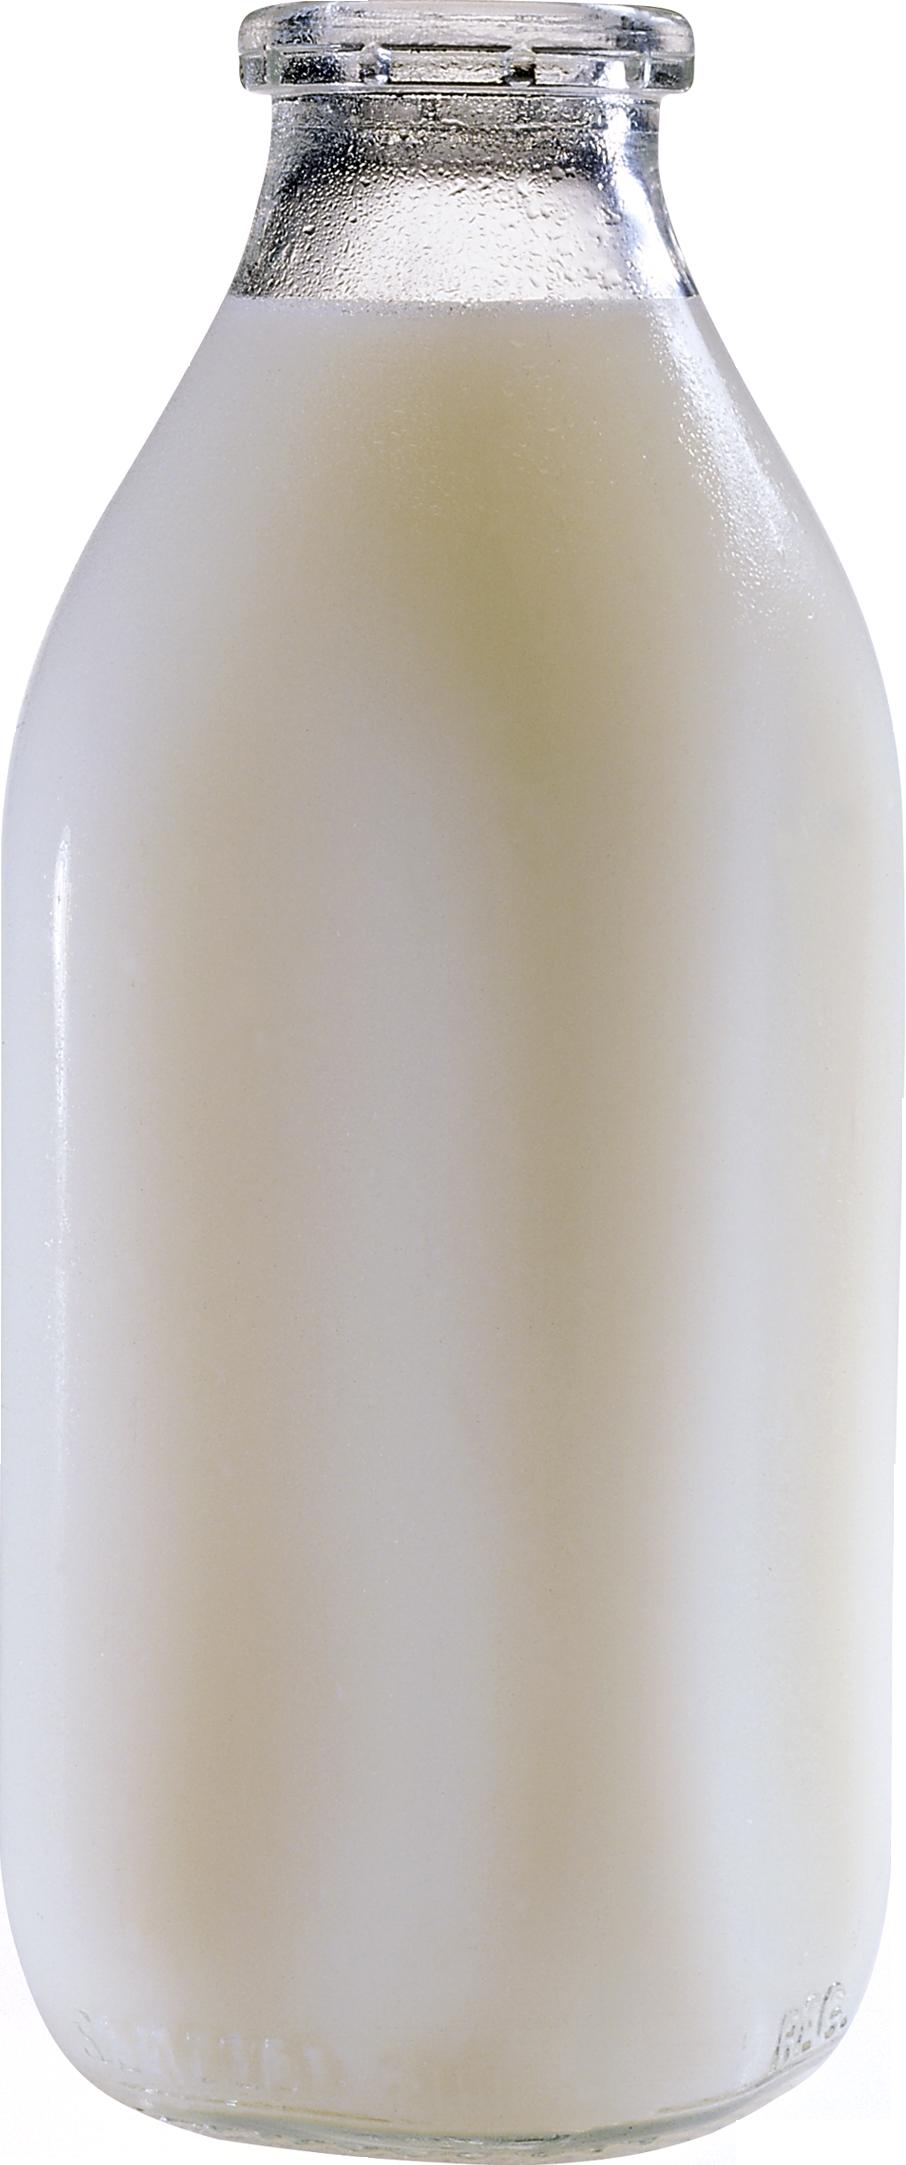 . Milk bottle png